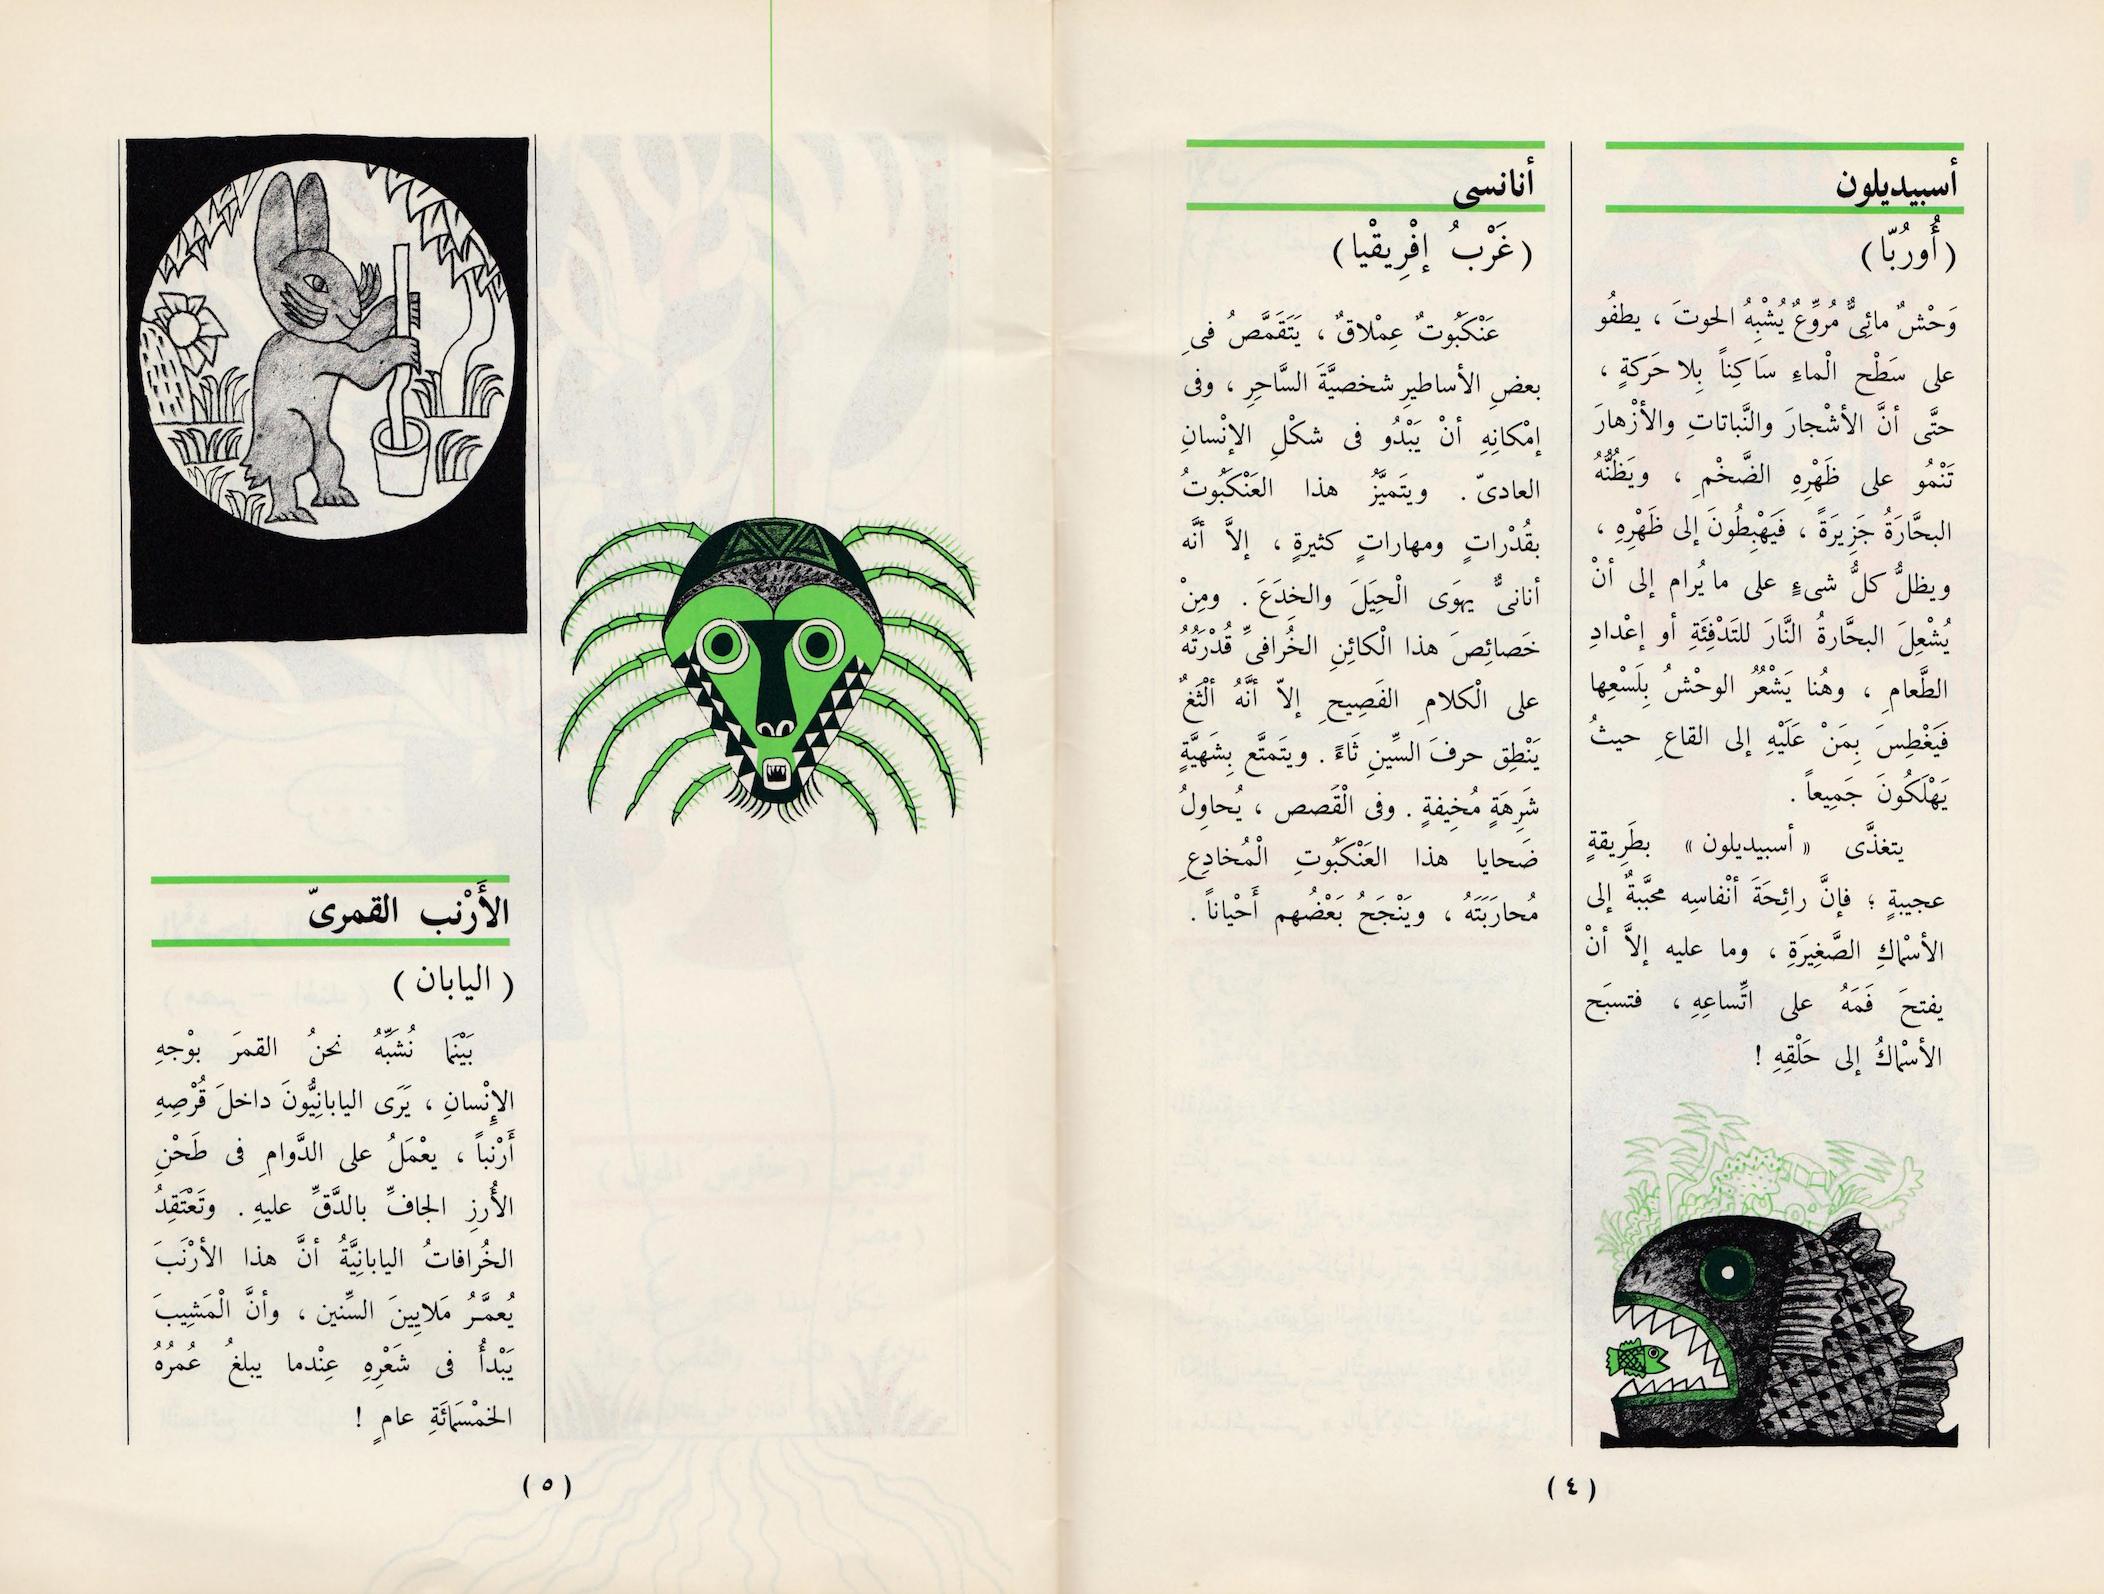 Art Culture Egyptian Dictionary Of Illustrated Mythological Creatures 1985 Mythological Creatures Japanese Myth Mythology